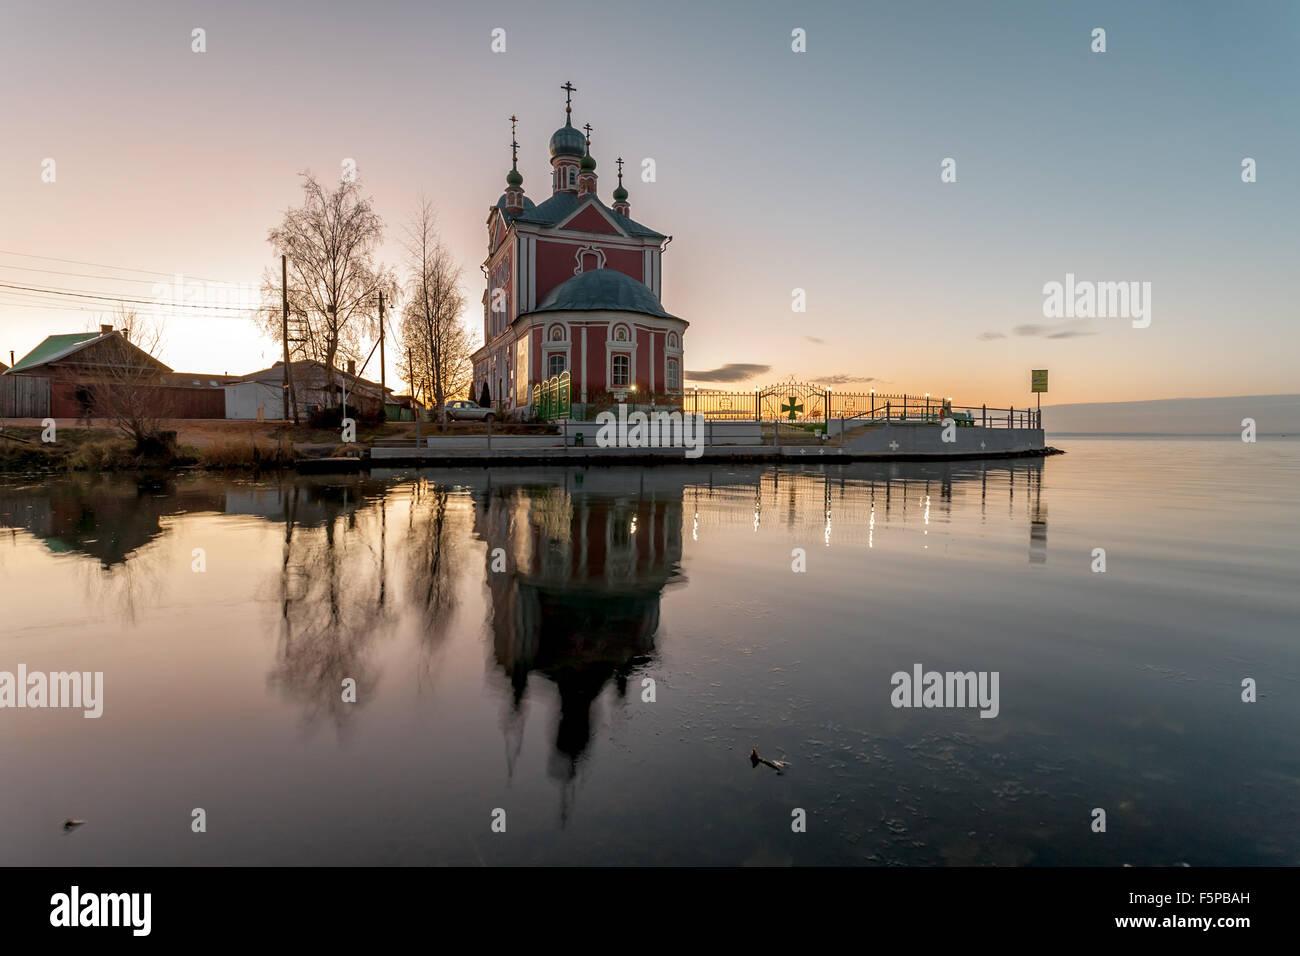 Pereslavl-Zalessky, Russia - November 07, 2015: Sorokosvyatsky church, of Forty martyrs Sevastiysky  1775. View - Stock Image